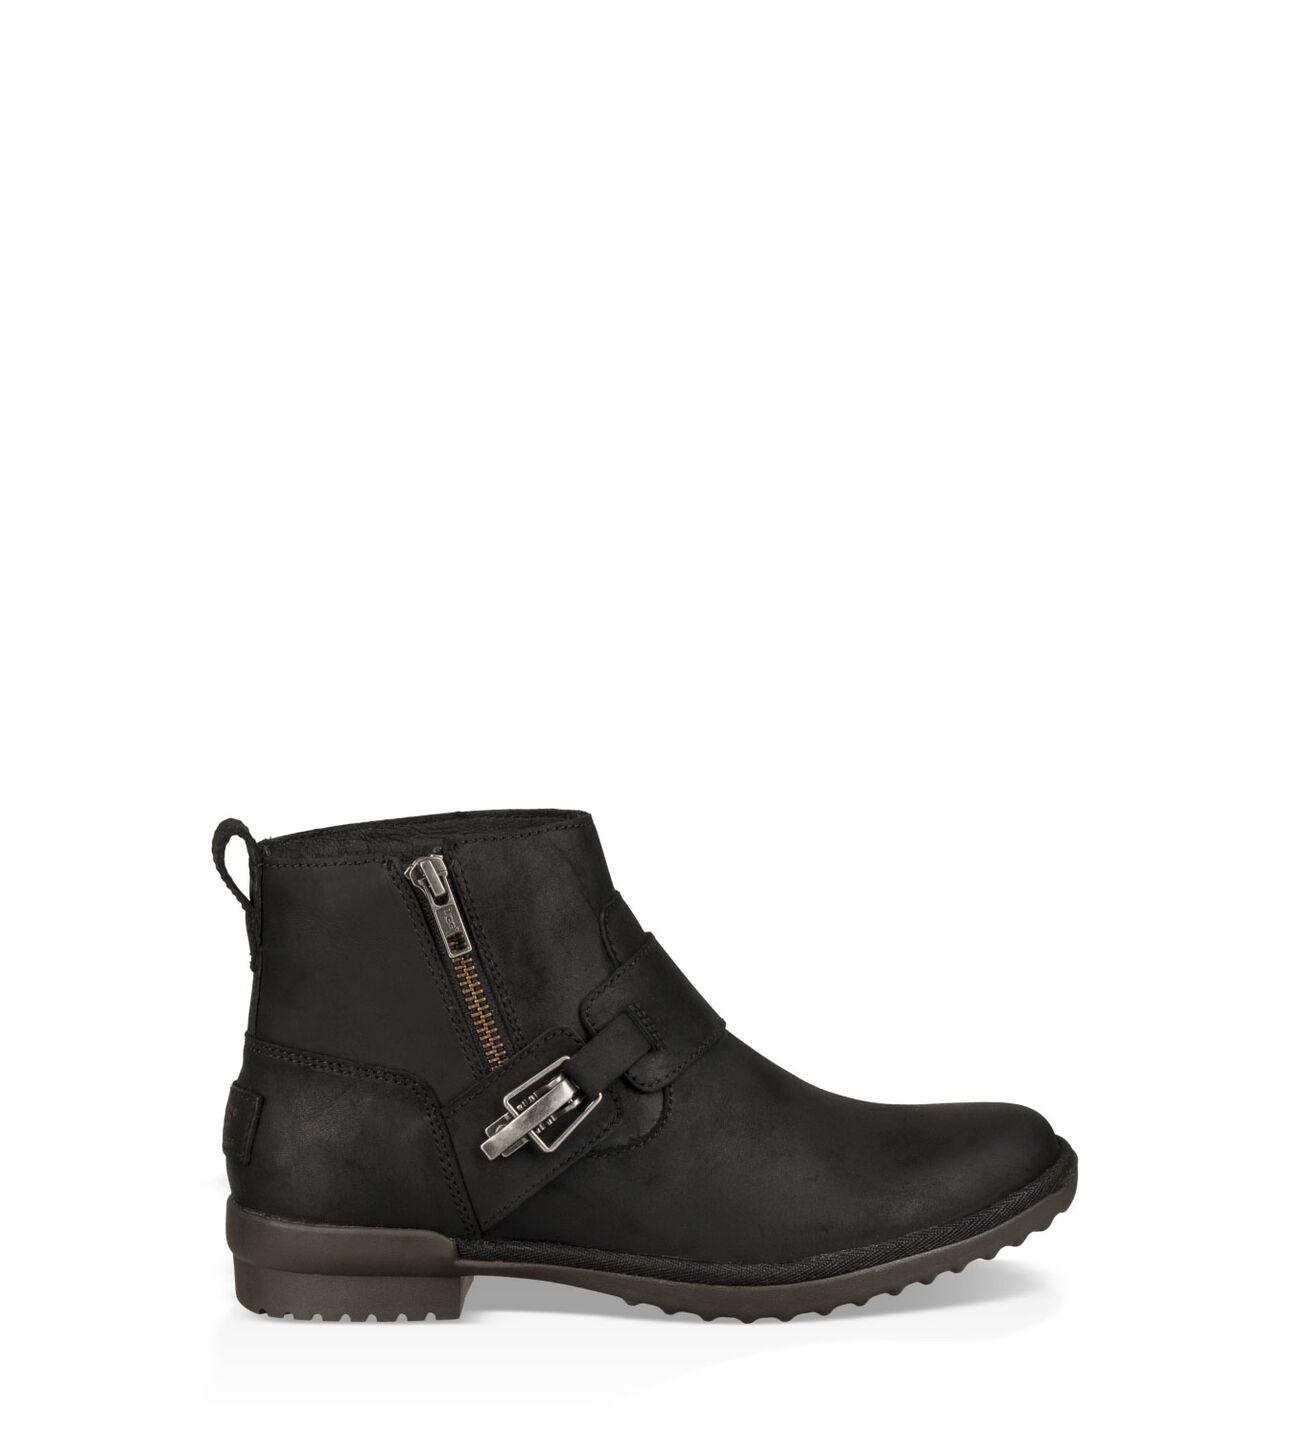 b9523d5e48f Cheyne Boot